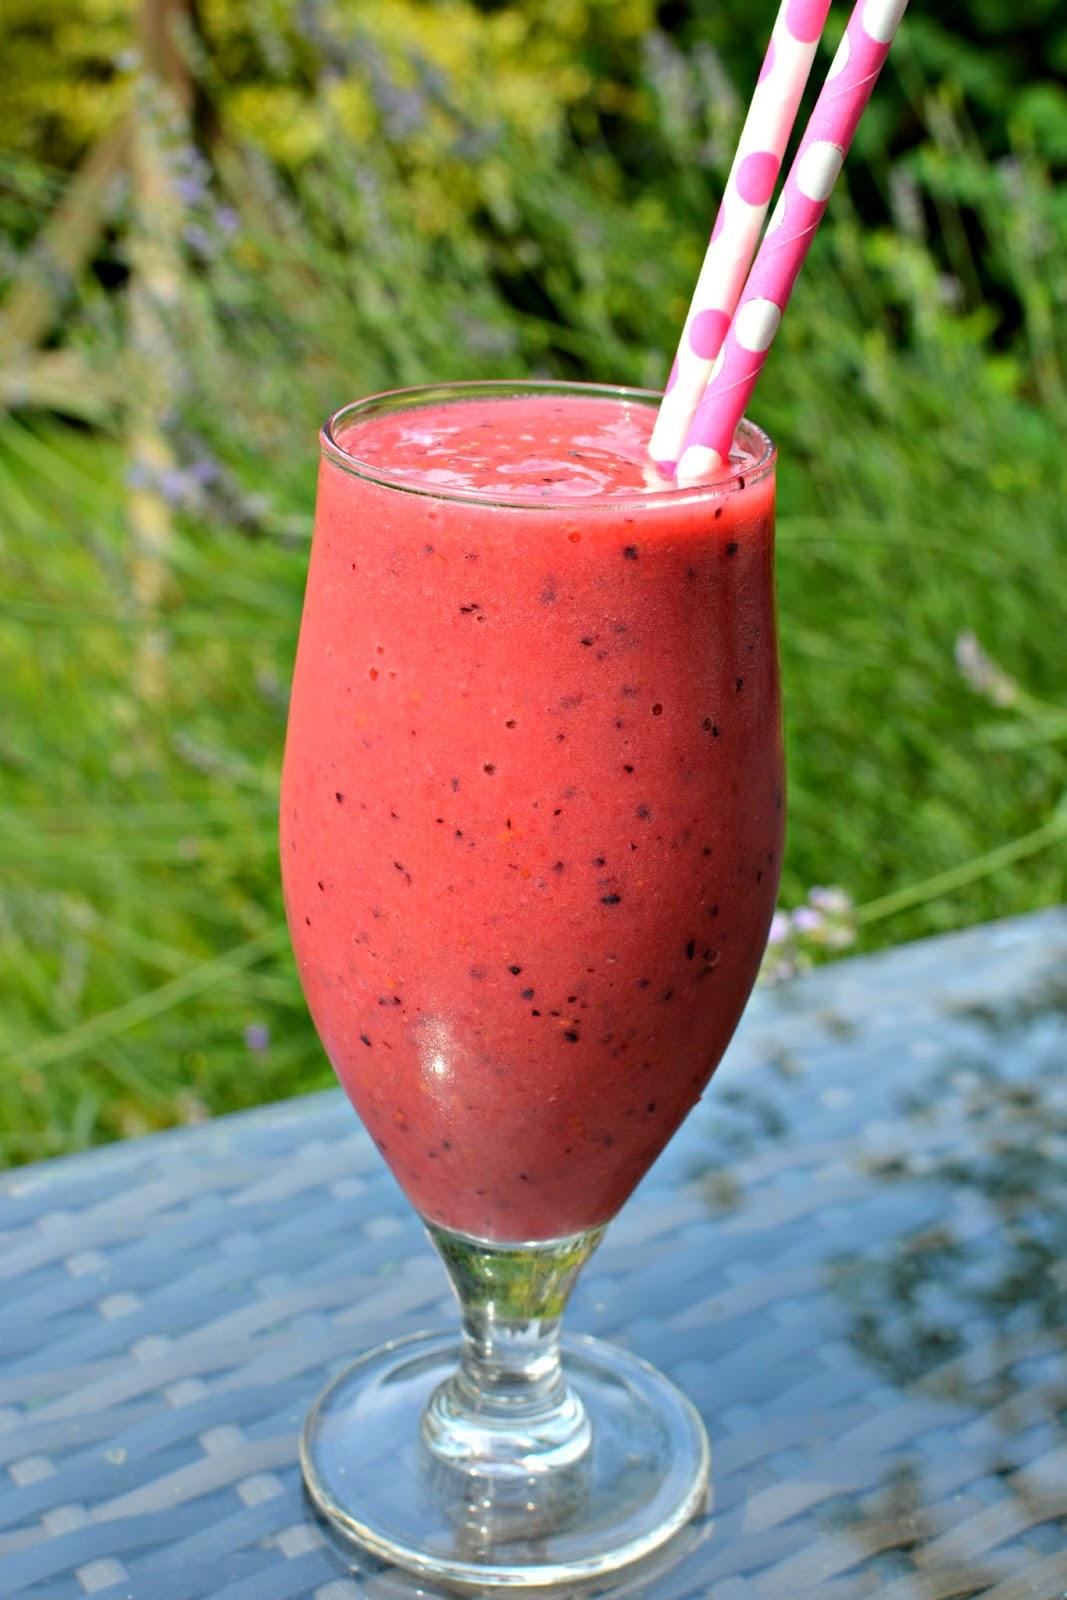 banana and berry smoothie recipe